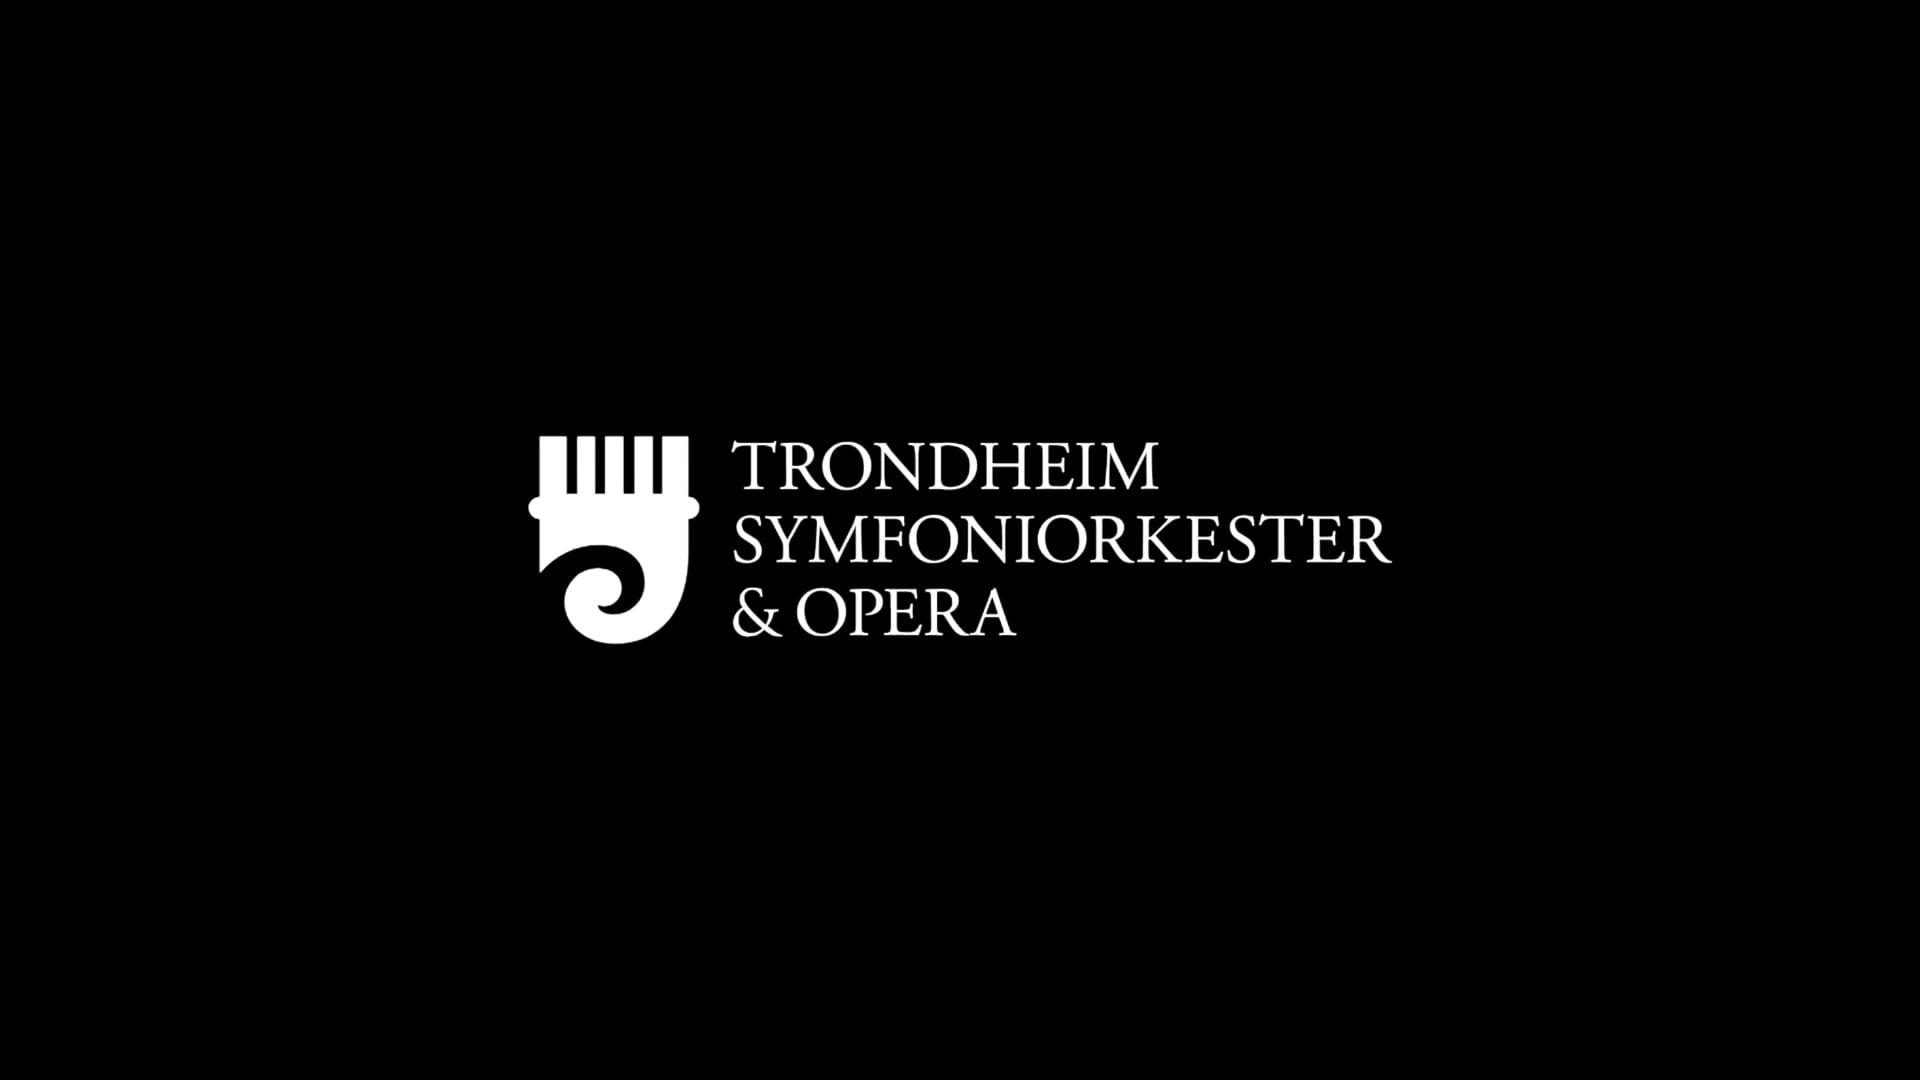 Trondheim Symfoniorkester & Opera - Sør-Korea (Intro Peer Gynt Tour) (장한나 & 트론헤임 심포니오케스트라)